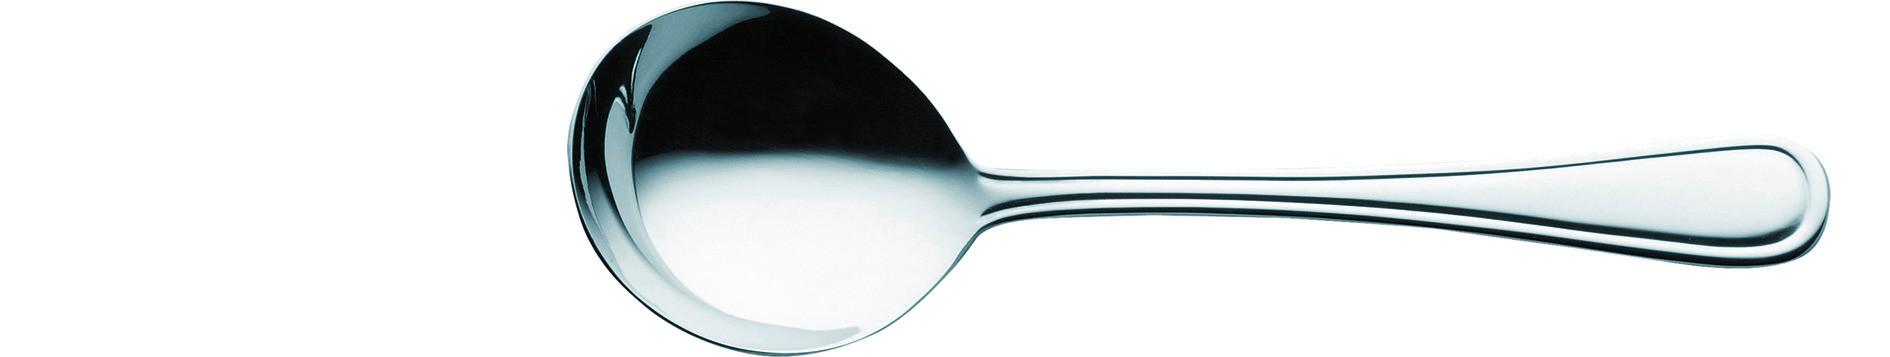 Selina, Servier- / Kartoffellöffel 221 mm